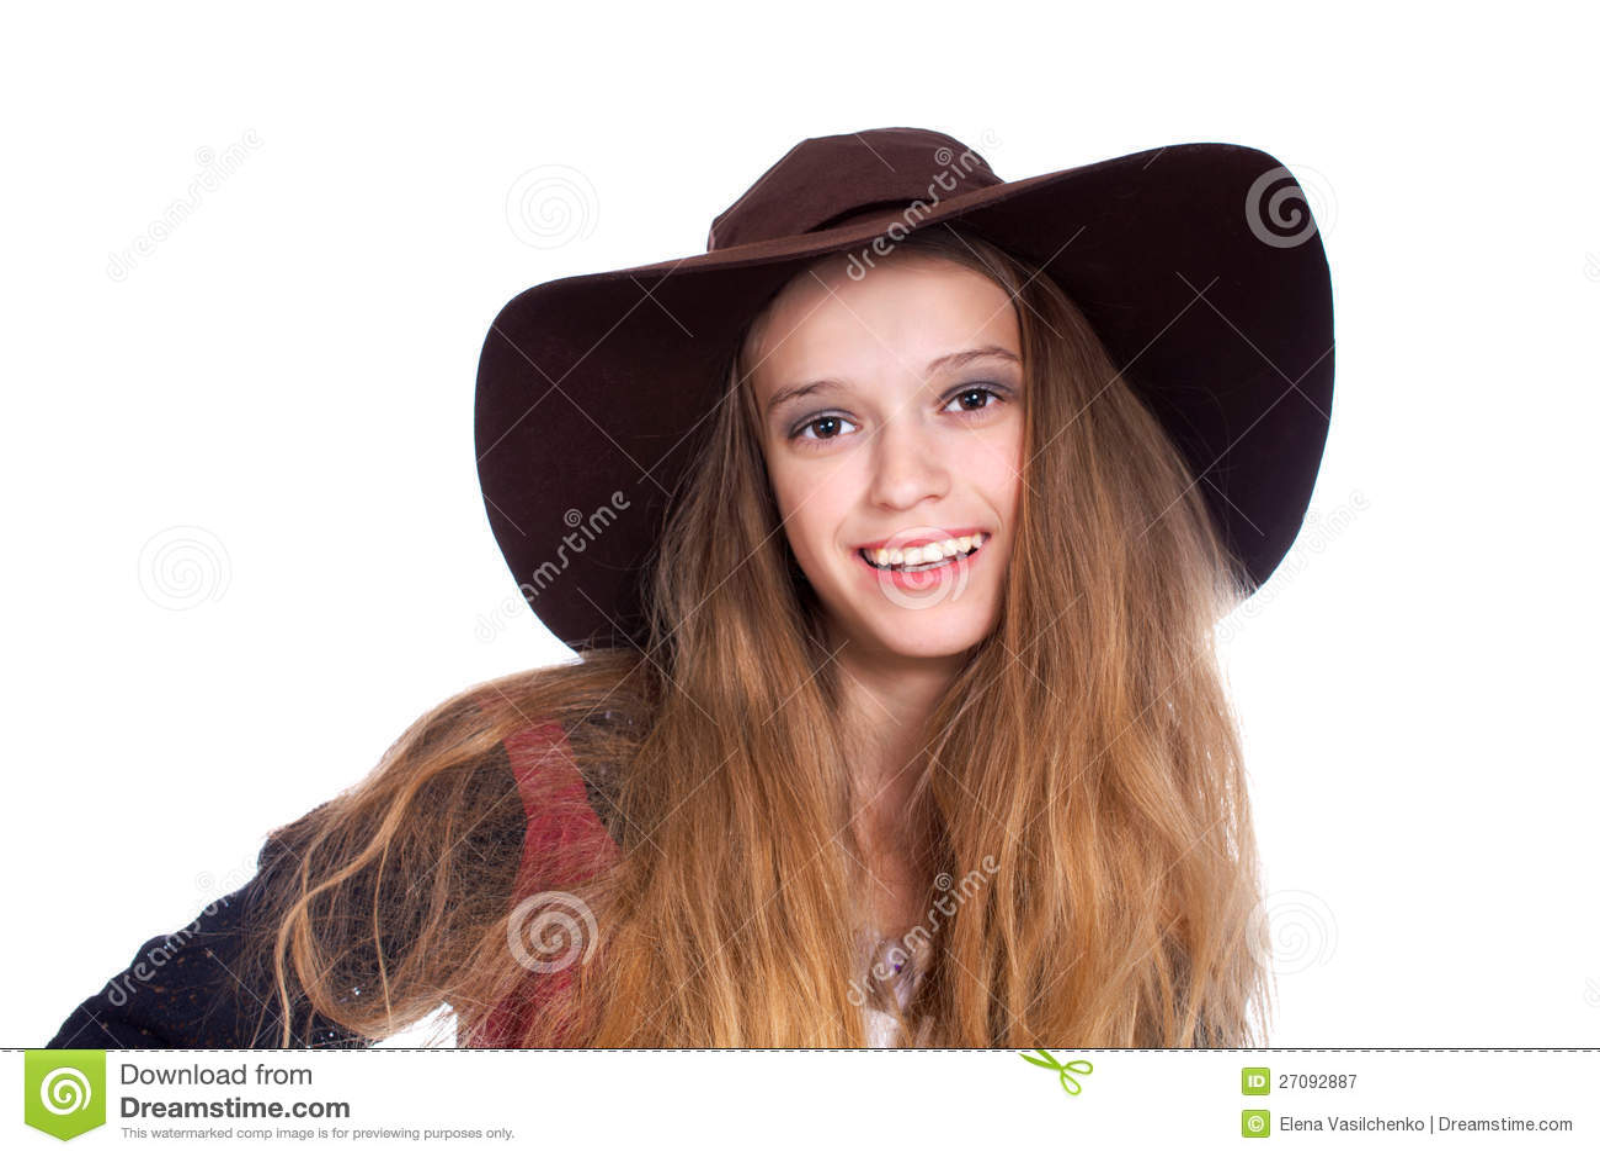 Teen Girl Wearing Dark Brimmy Hat Royalty Free Stock